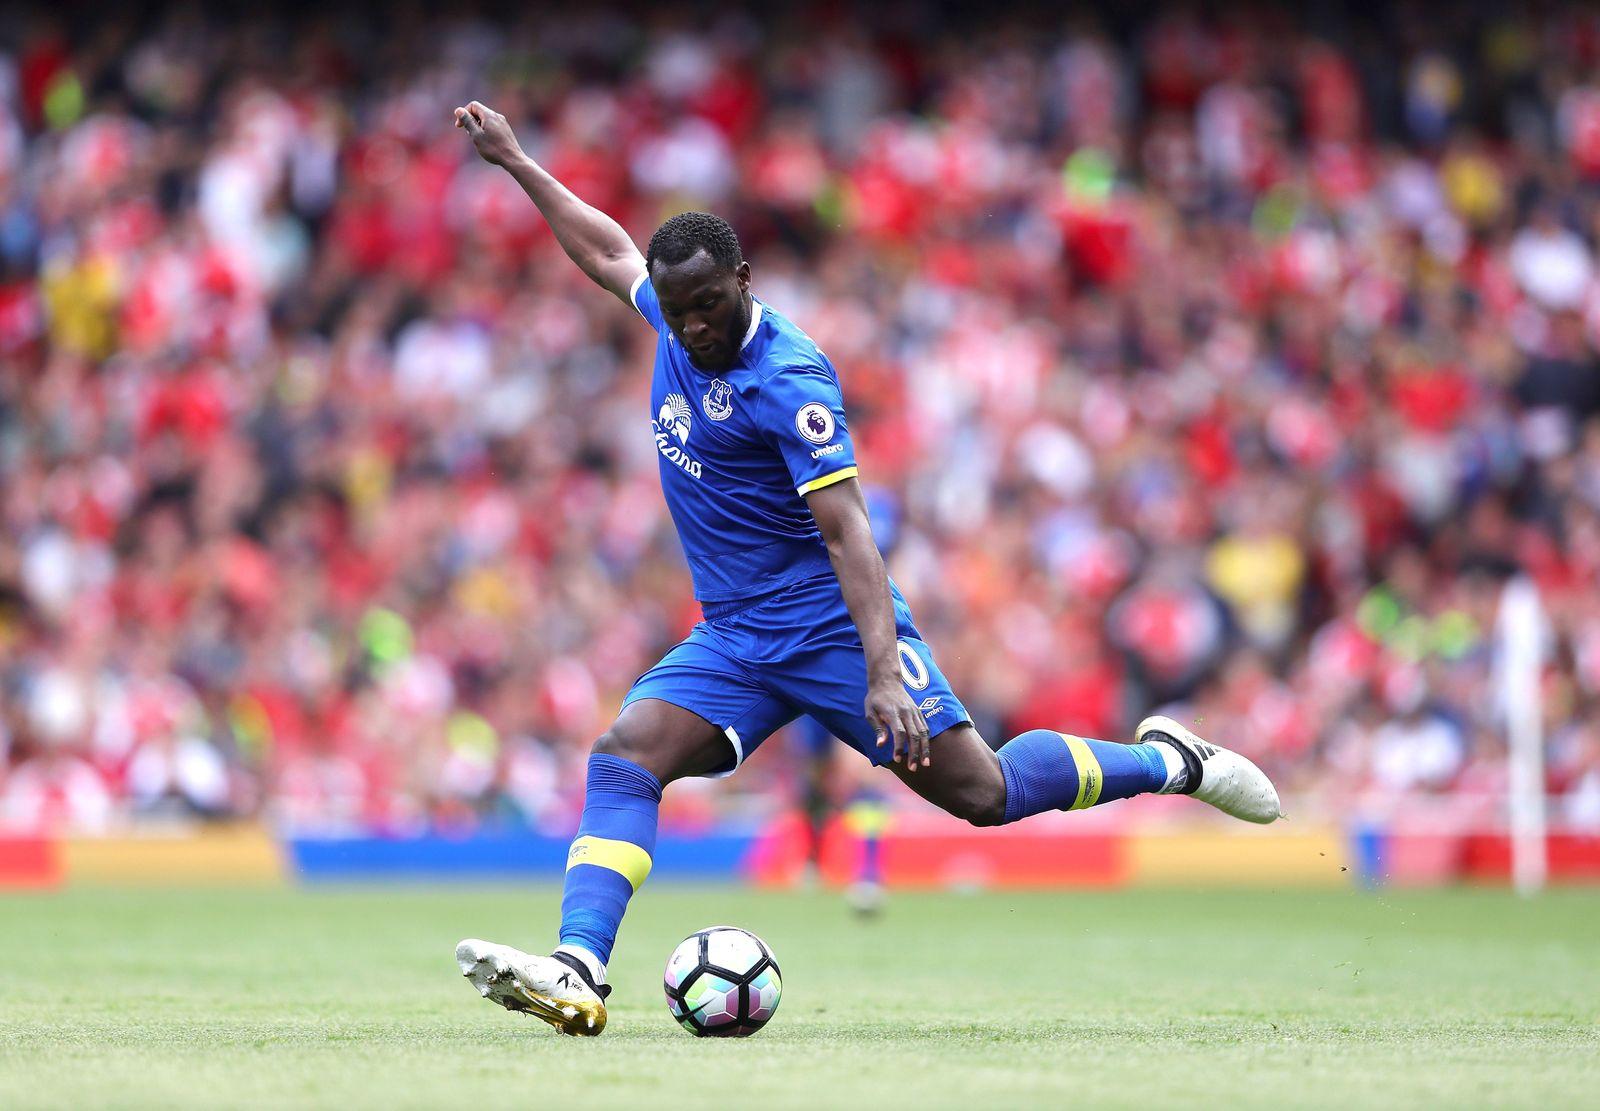 Romelu Lukaku/ Everton